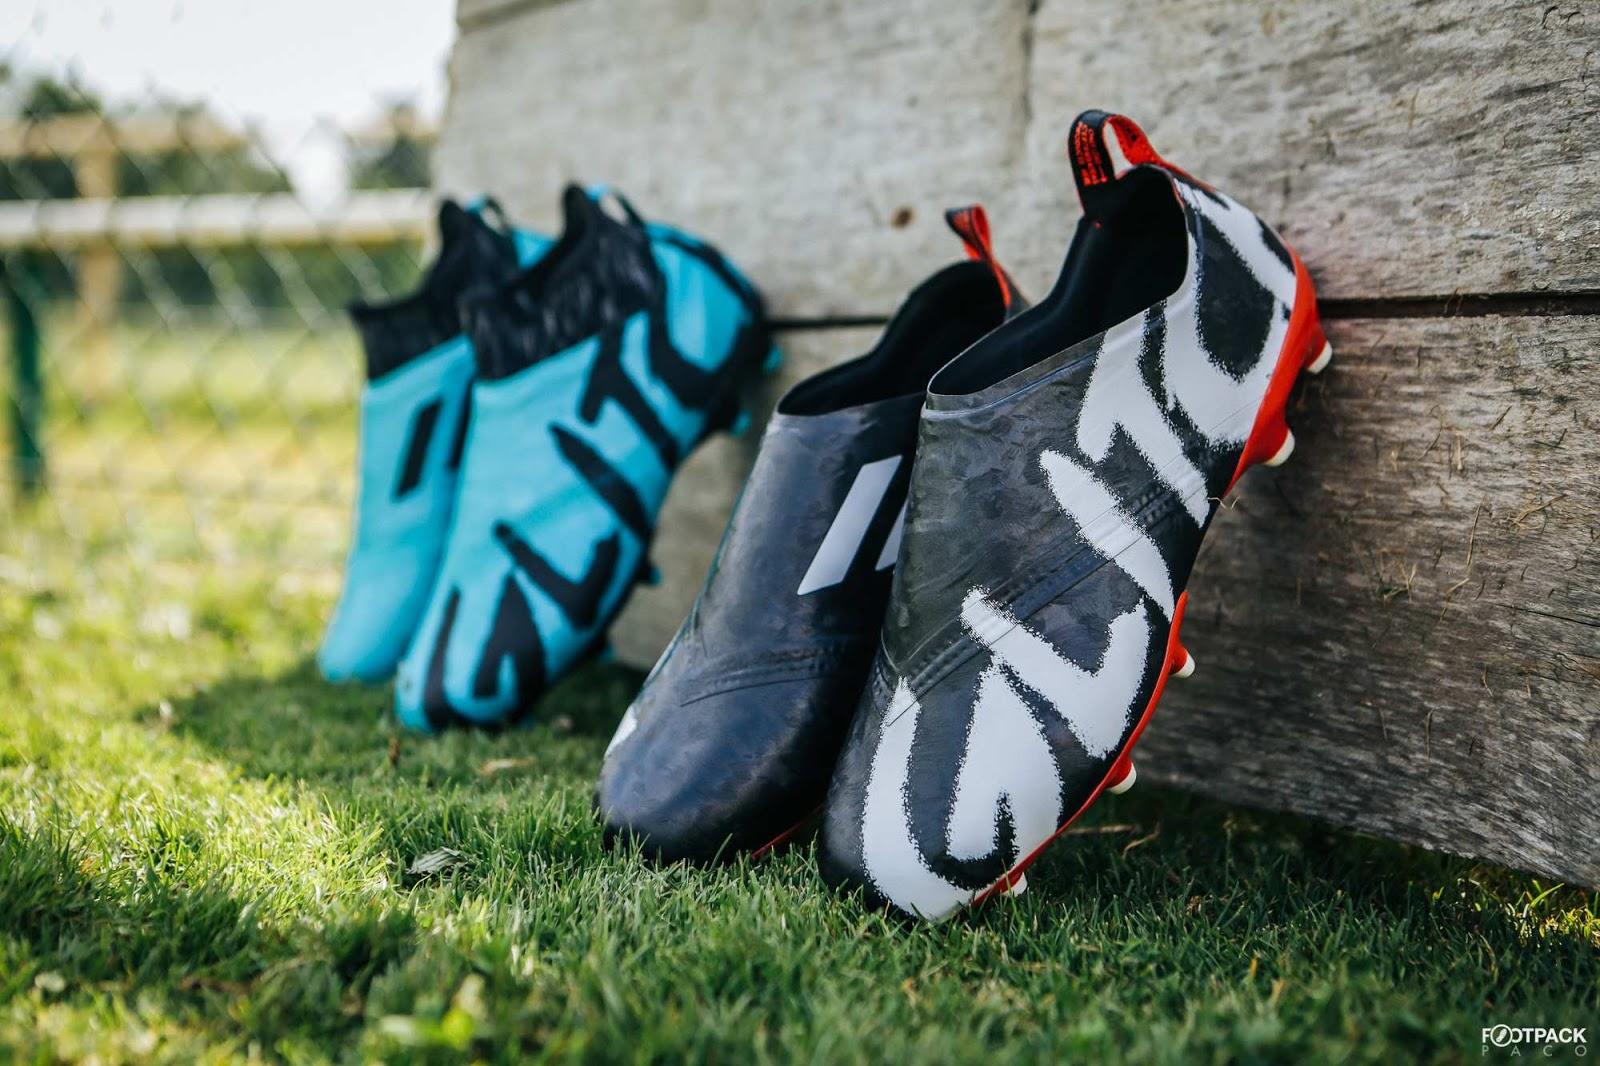 Adidas Glitch 2018-19 Devo Skin Boots Pack Released - leaked soccer f6f11089dc4